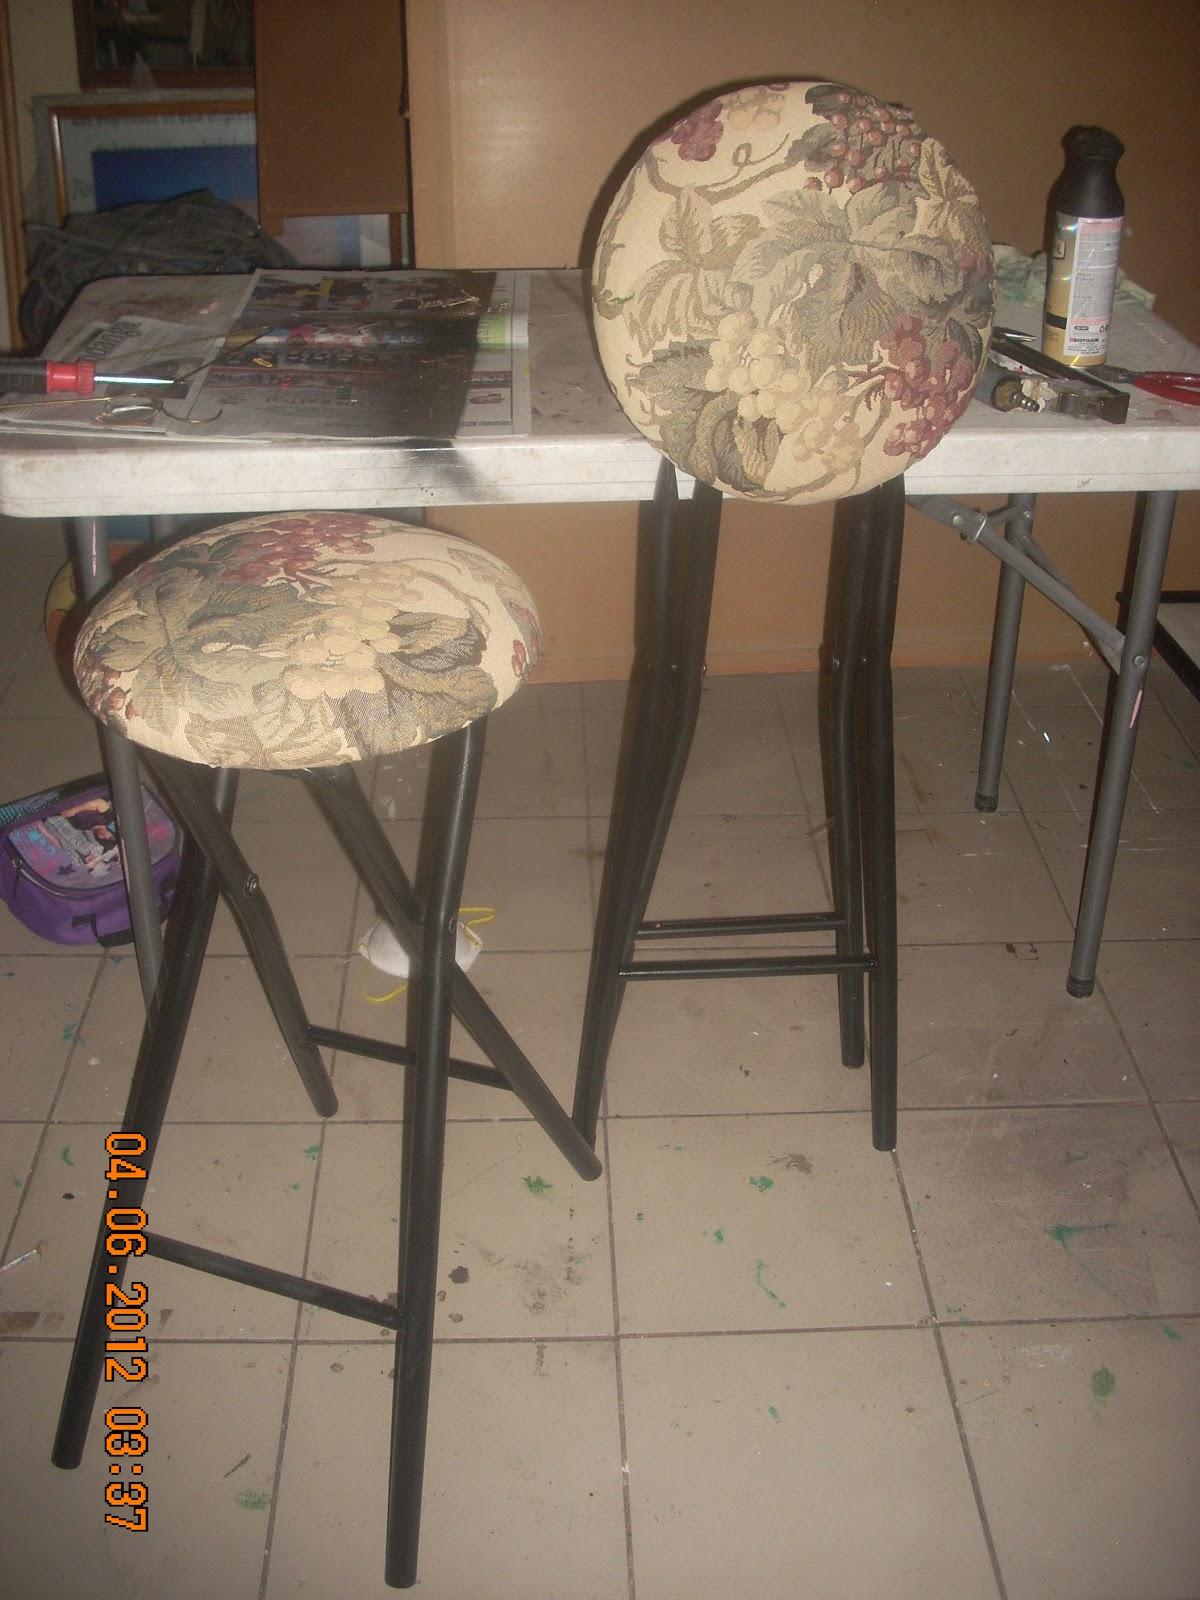 Mis creaciones e ideas bancos para barra - Esponja para tapizar ...